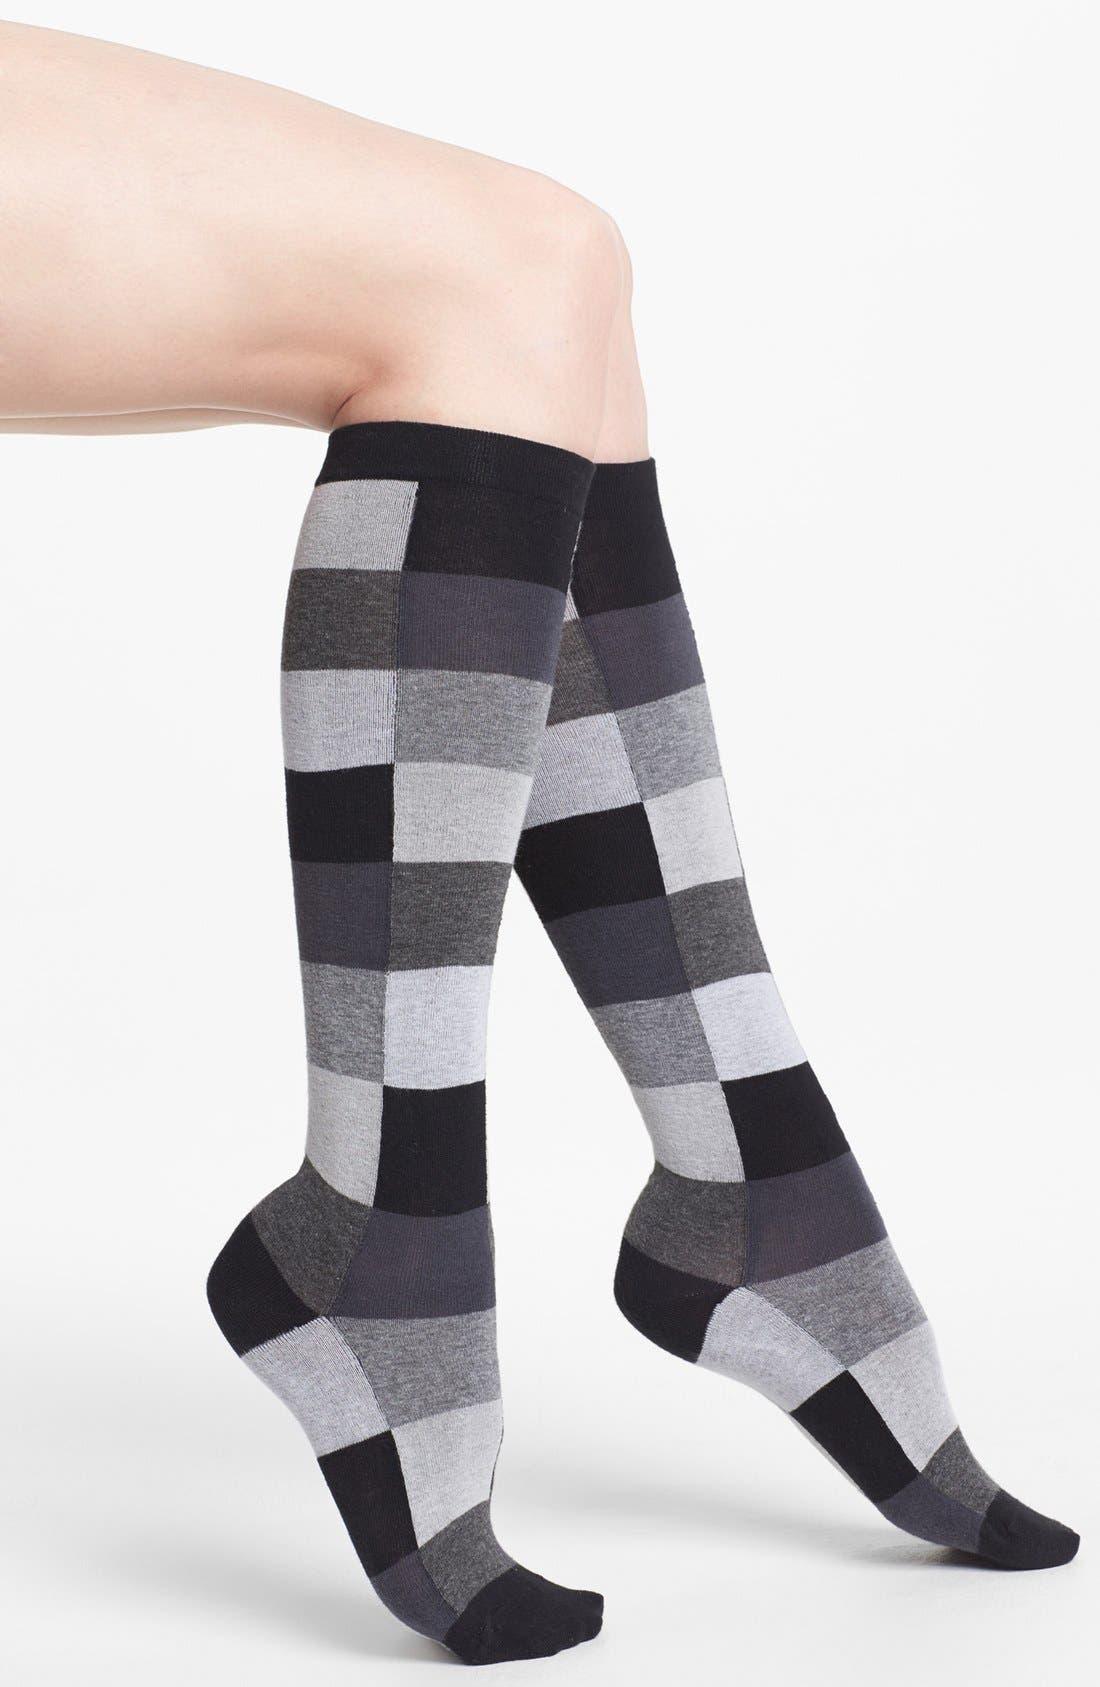 Main Image - Hue Colorblock Knee High Socks